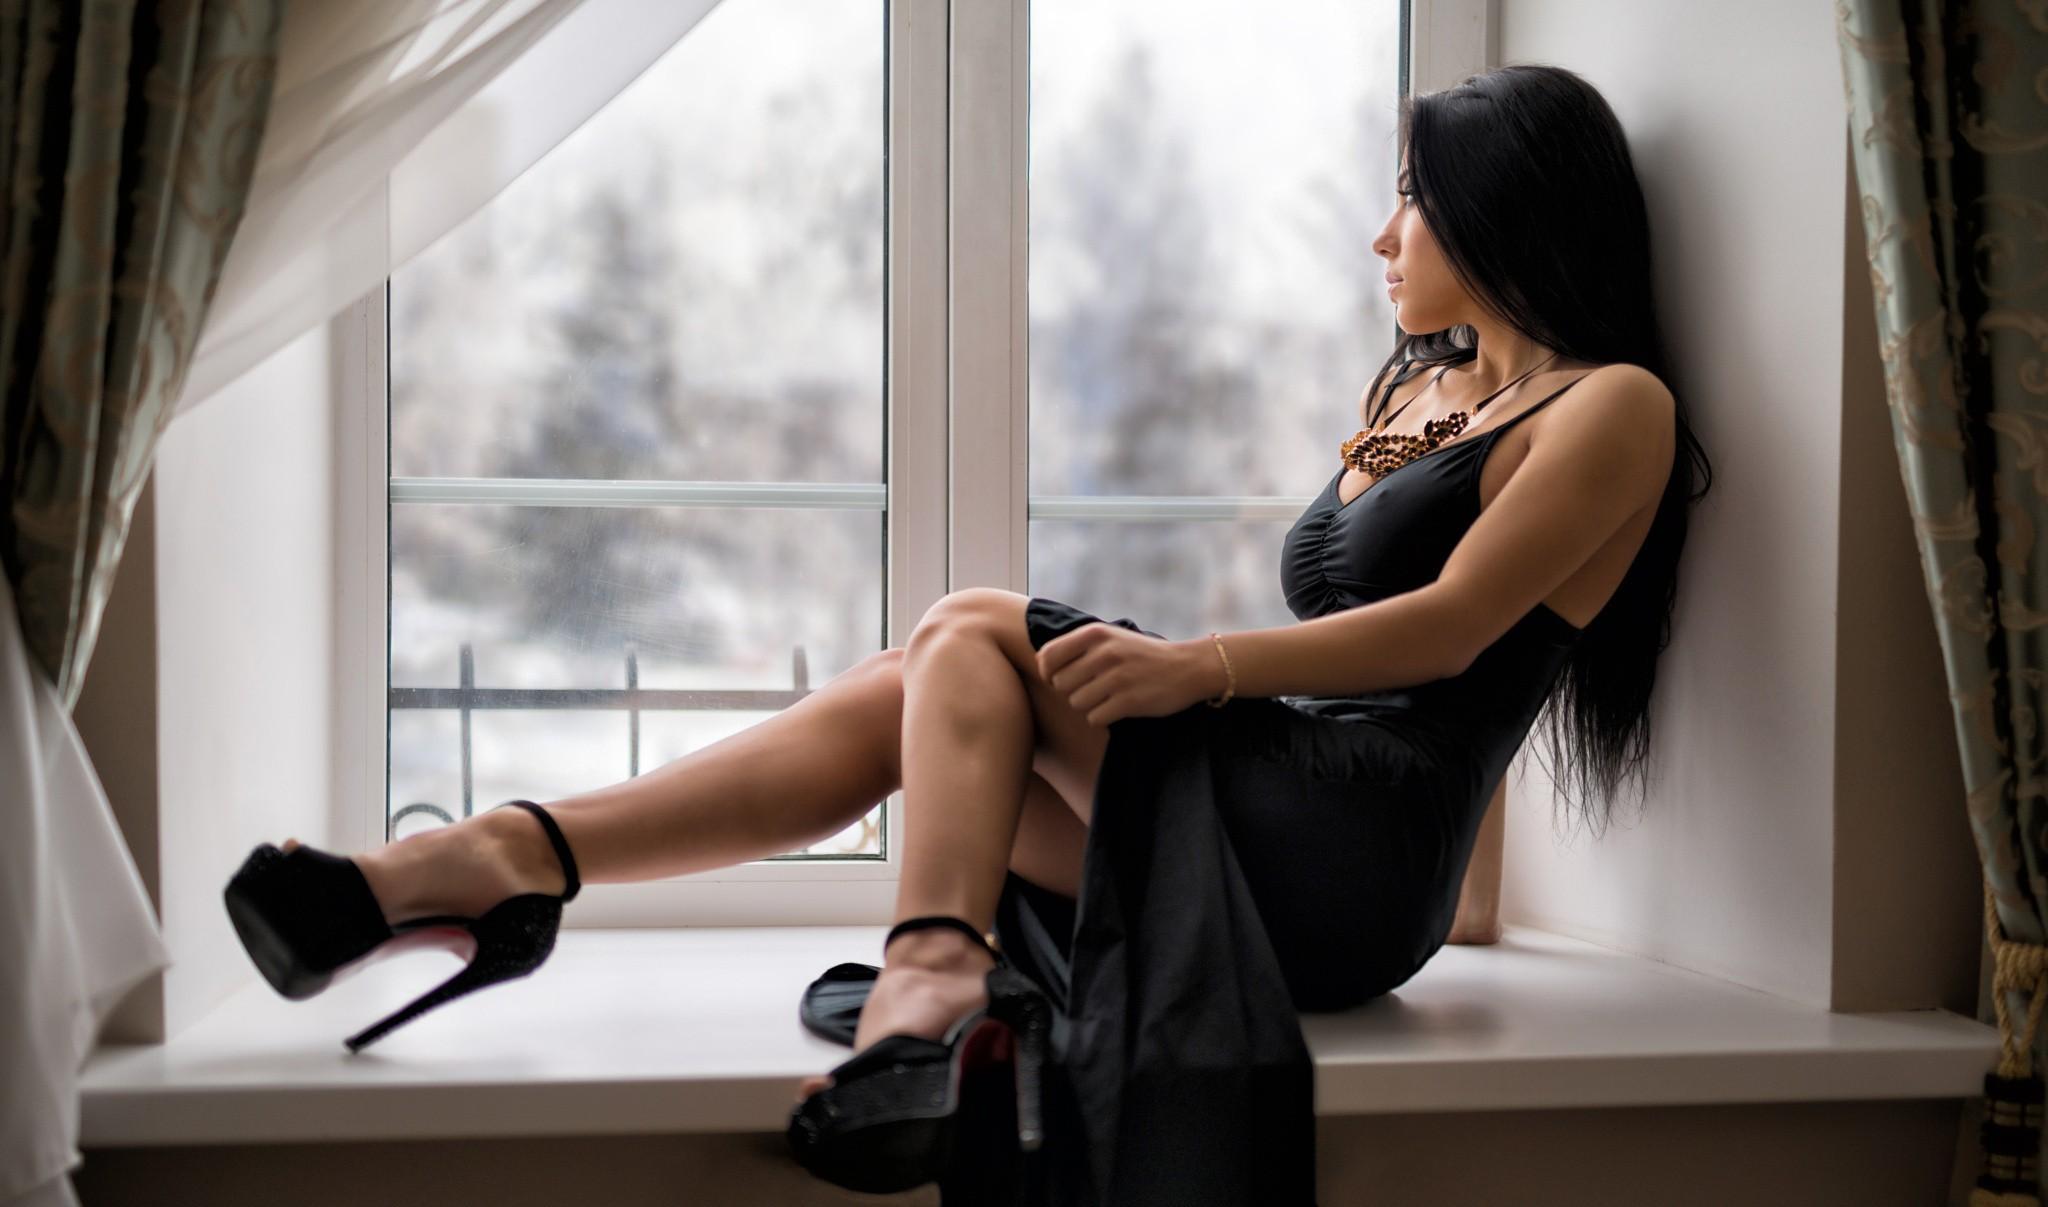 Marina Shimkovich Hd Background